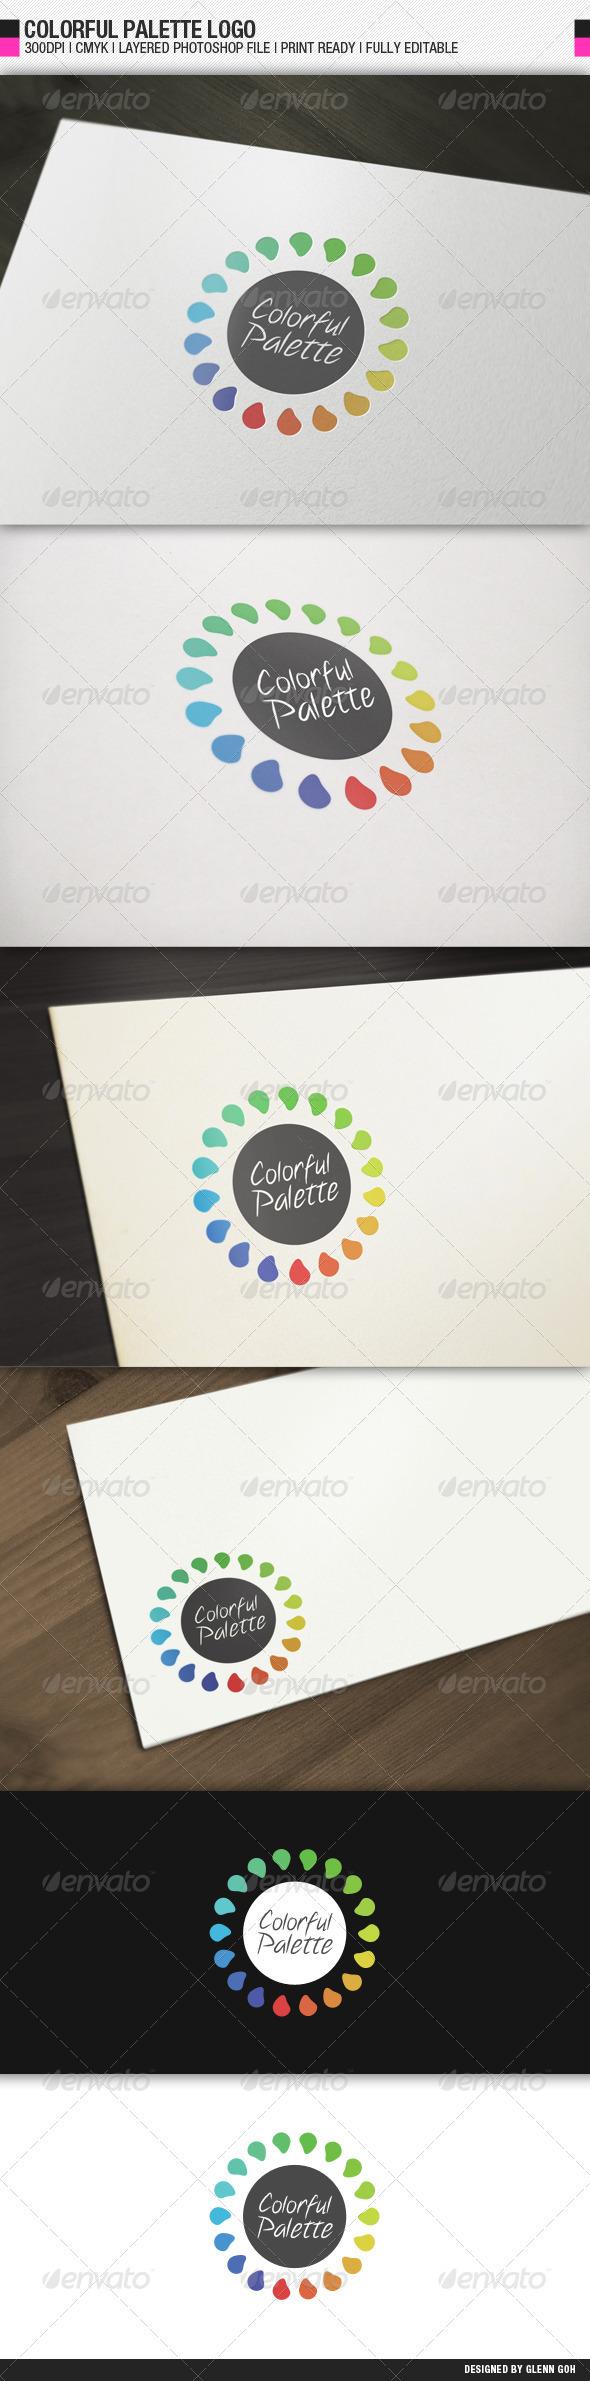 Colorful Palette Logo